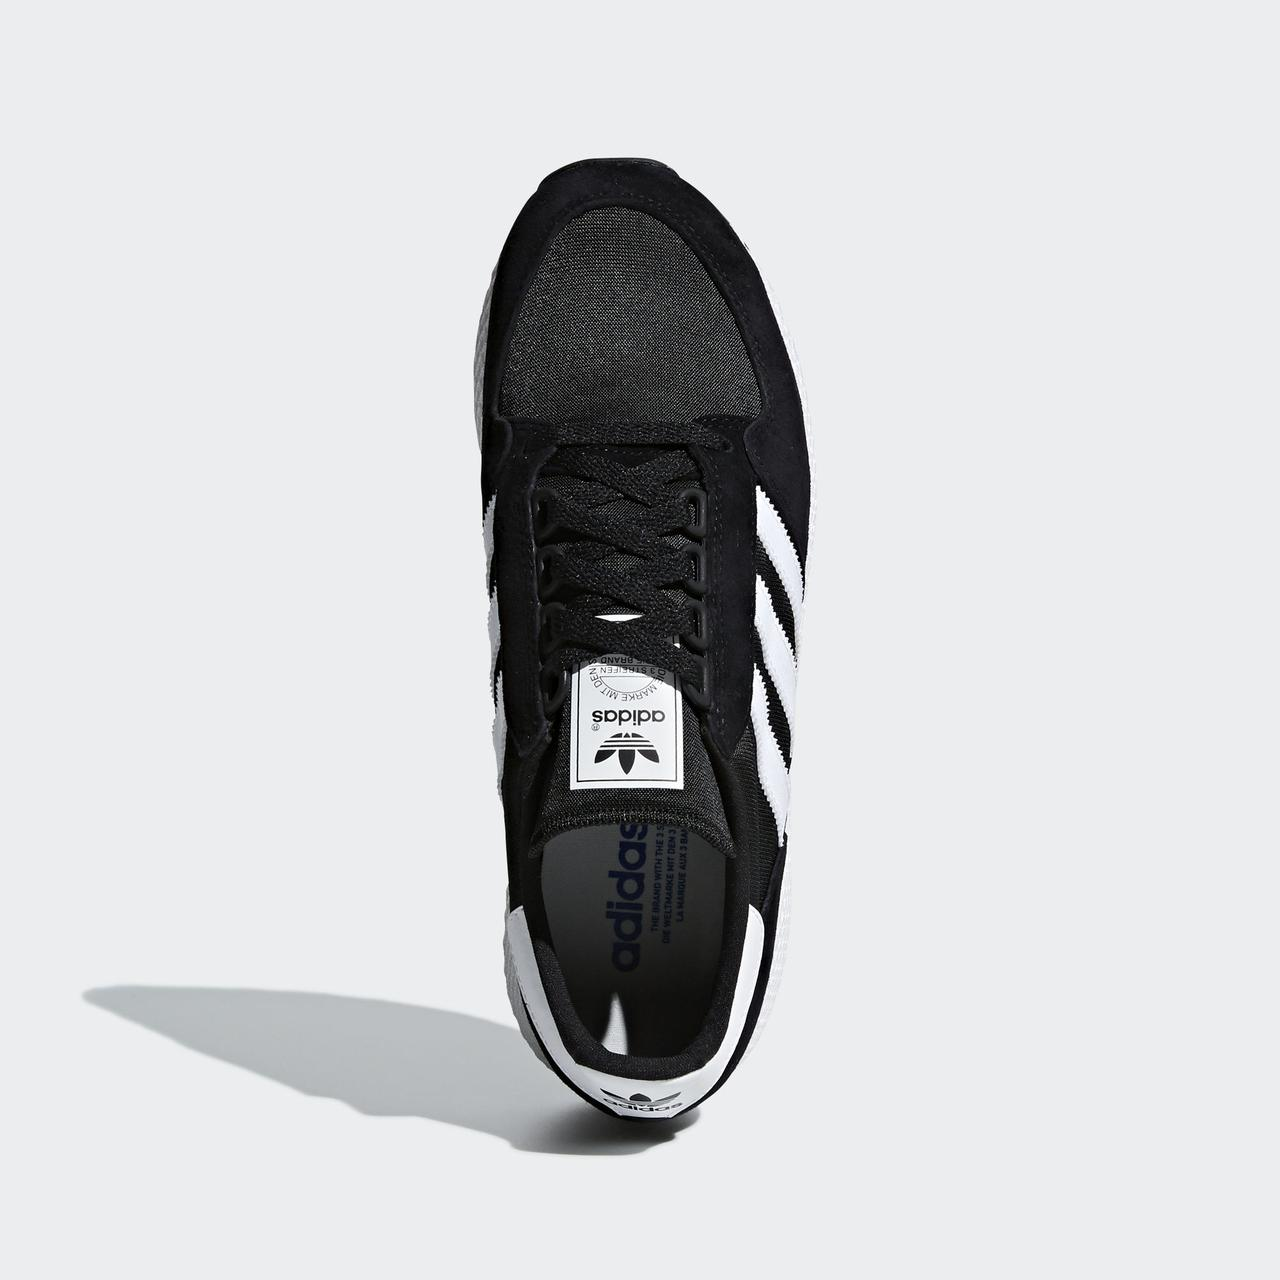 3666ea2accc5 ... Мужские кроссовки Adidas Originals Forest Grove (Артикул  B41550), ...